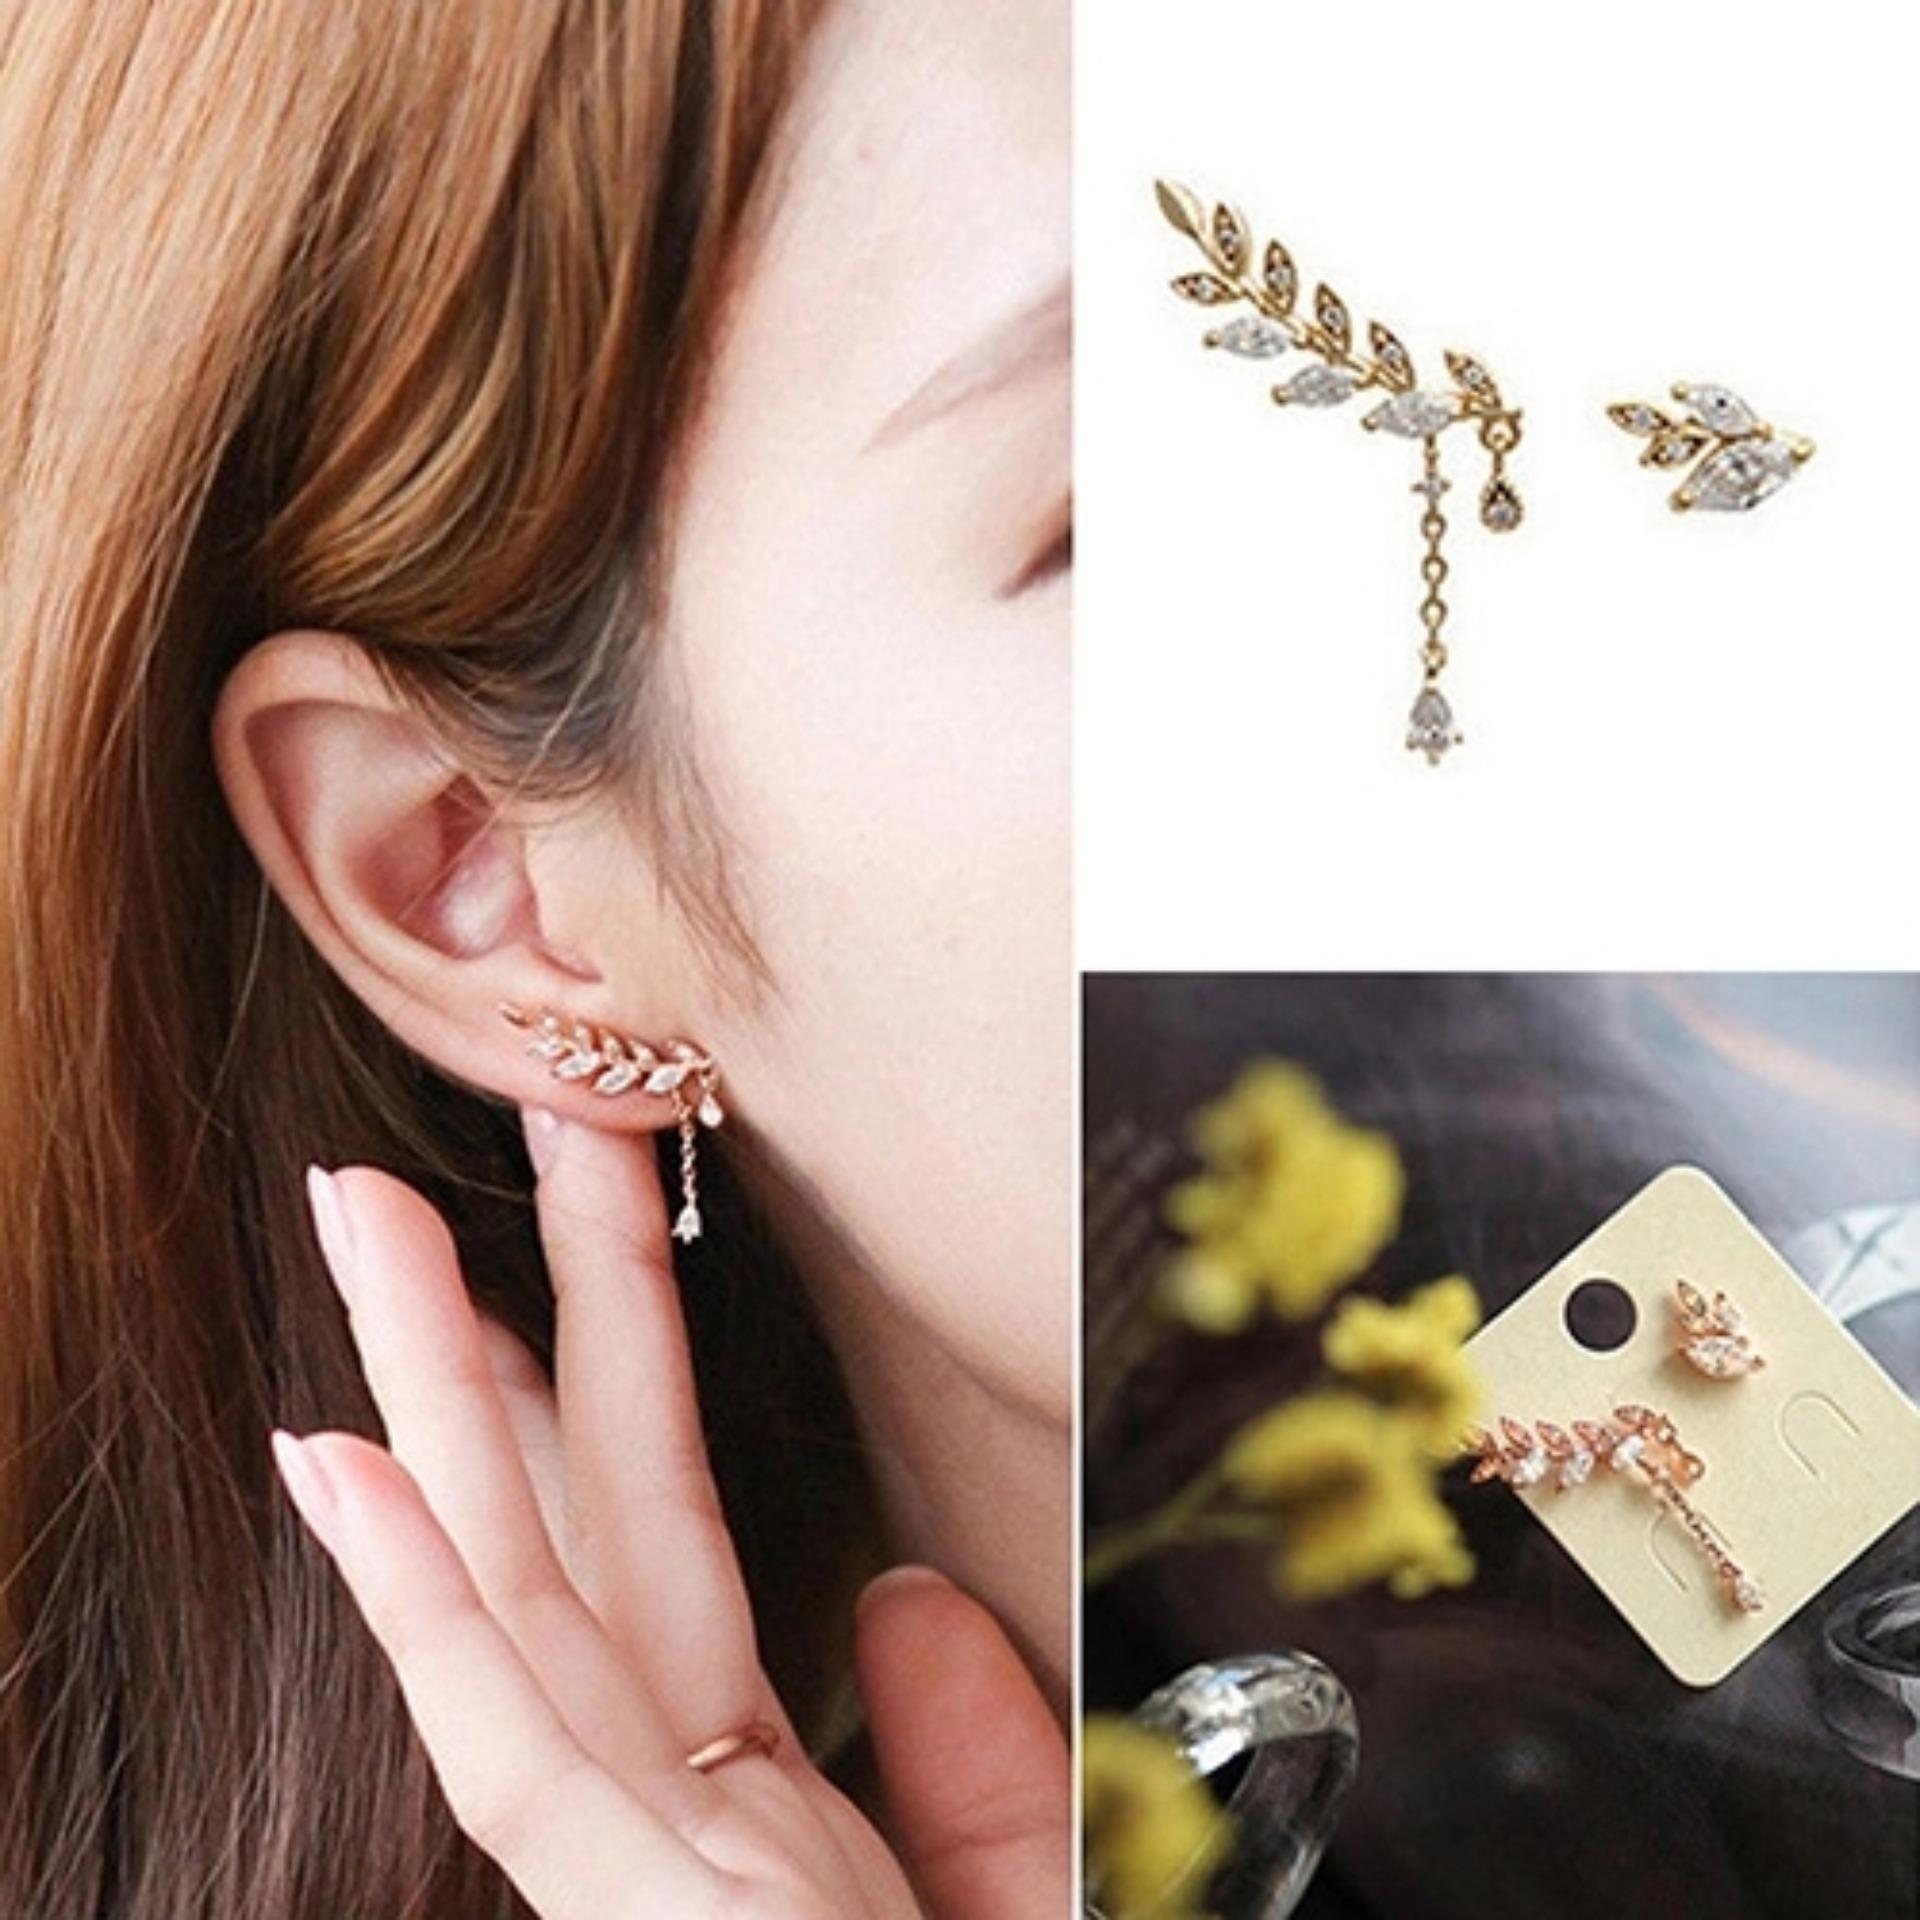 Anting Pear Mutiara Jepit Clip Earring Update Daftar Harga Terbaru Produk Ukm Bumn Mas Putih Laut Amefurashi Korea Daun Asimetris Asymmetric Leaf Dangle Beauty